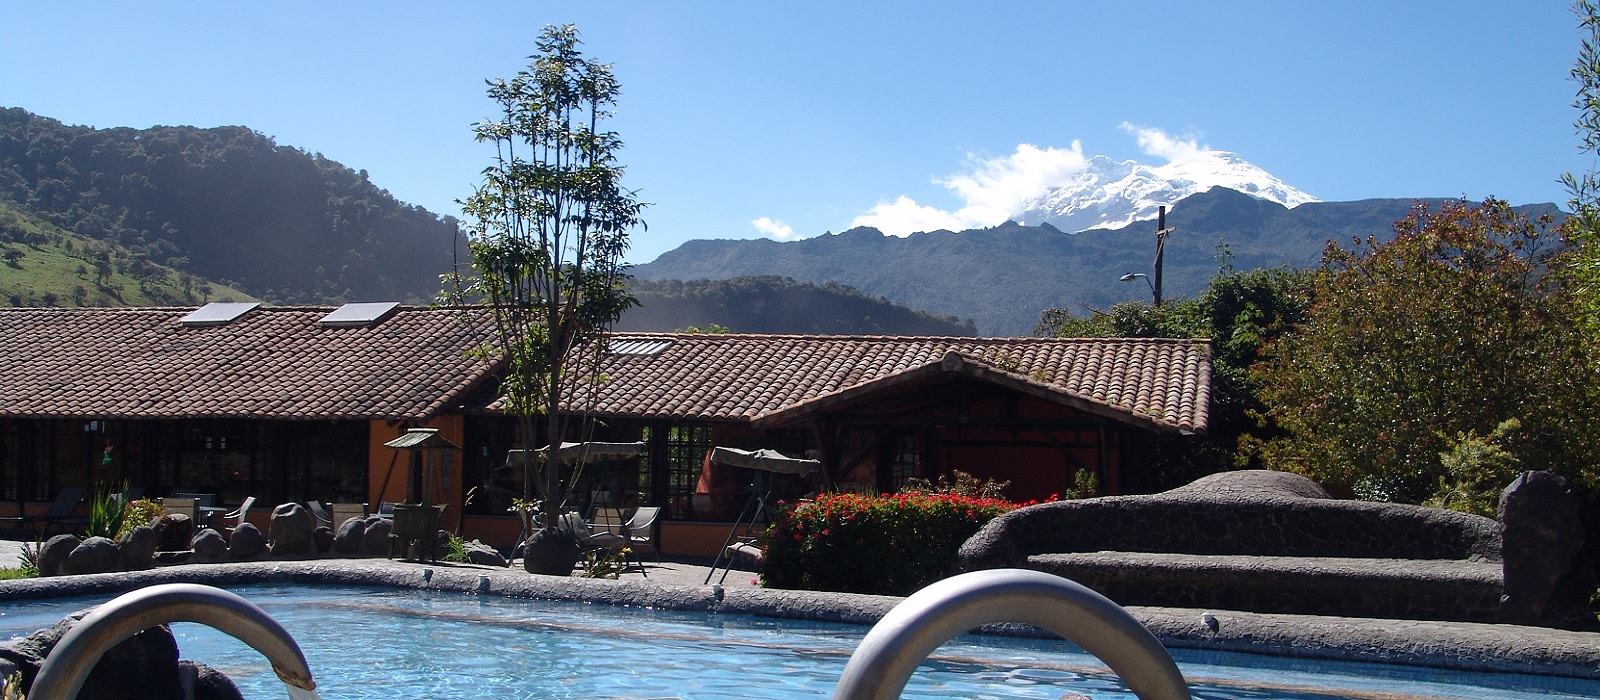 Hotel Papallacta Spa & Resort Ecuador/Galapagos